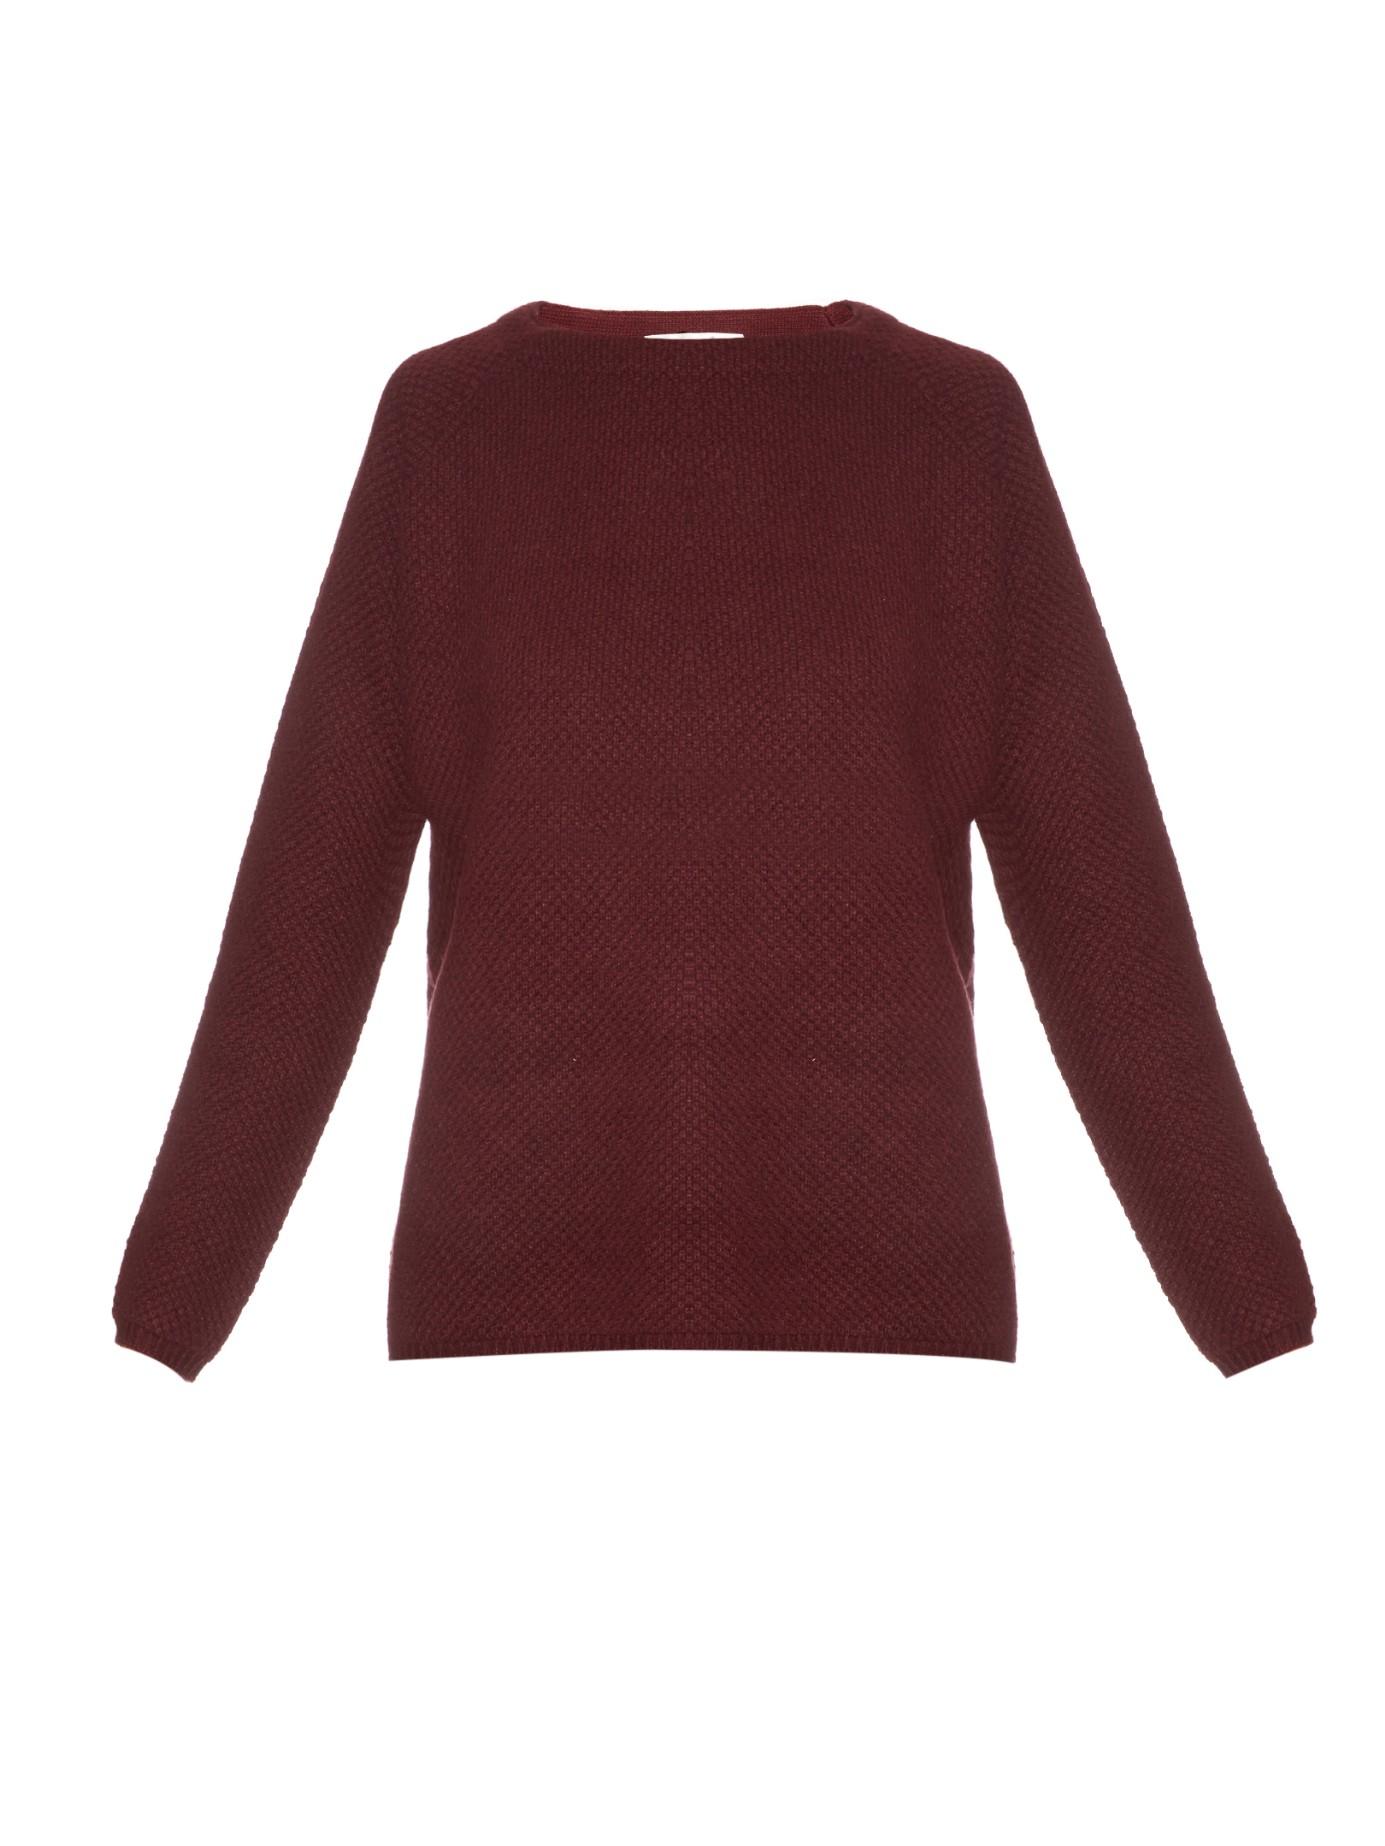 Goat Alice Waffle-knit Cashmere Sweater in Purple | Lyst